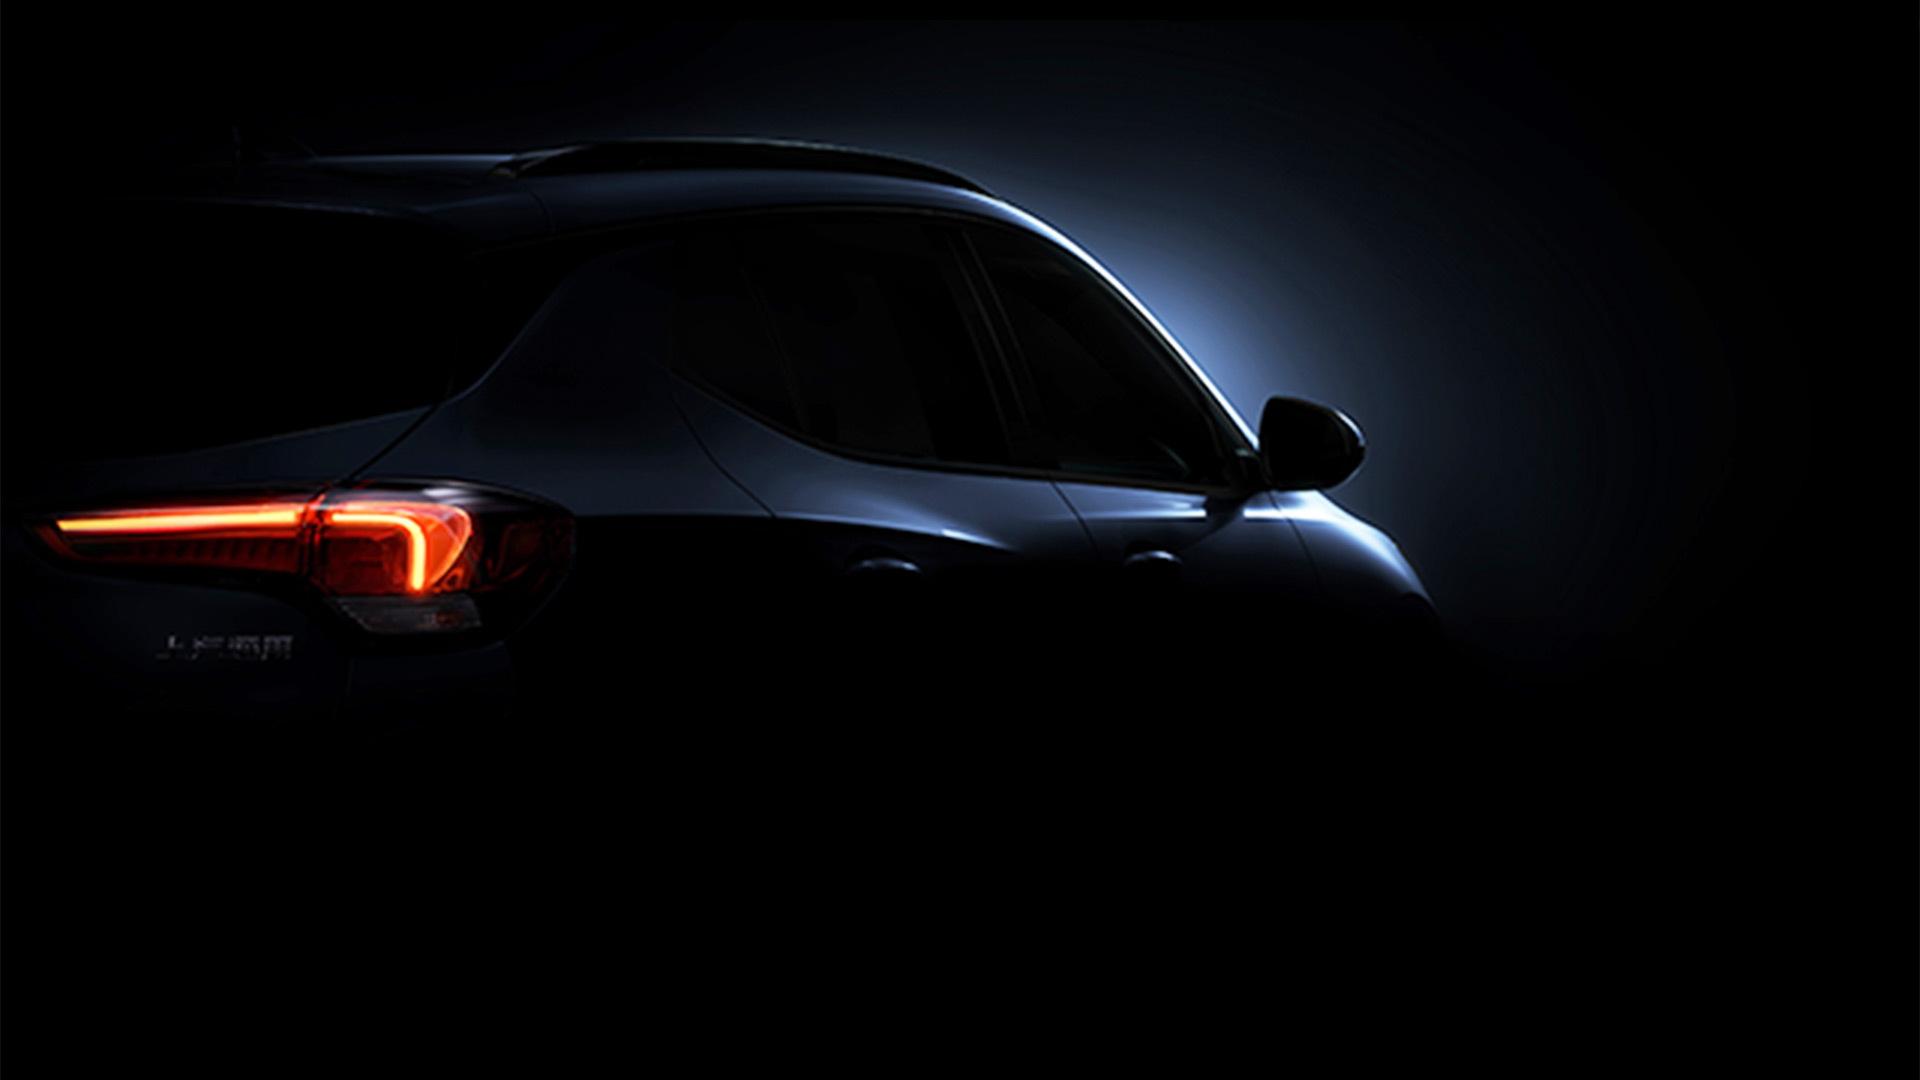 2020 Buick Encore Teased Ahead Of 2019 Shanghai Auto Show 金沙官网